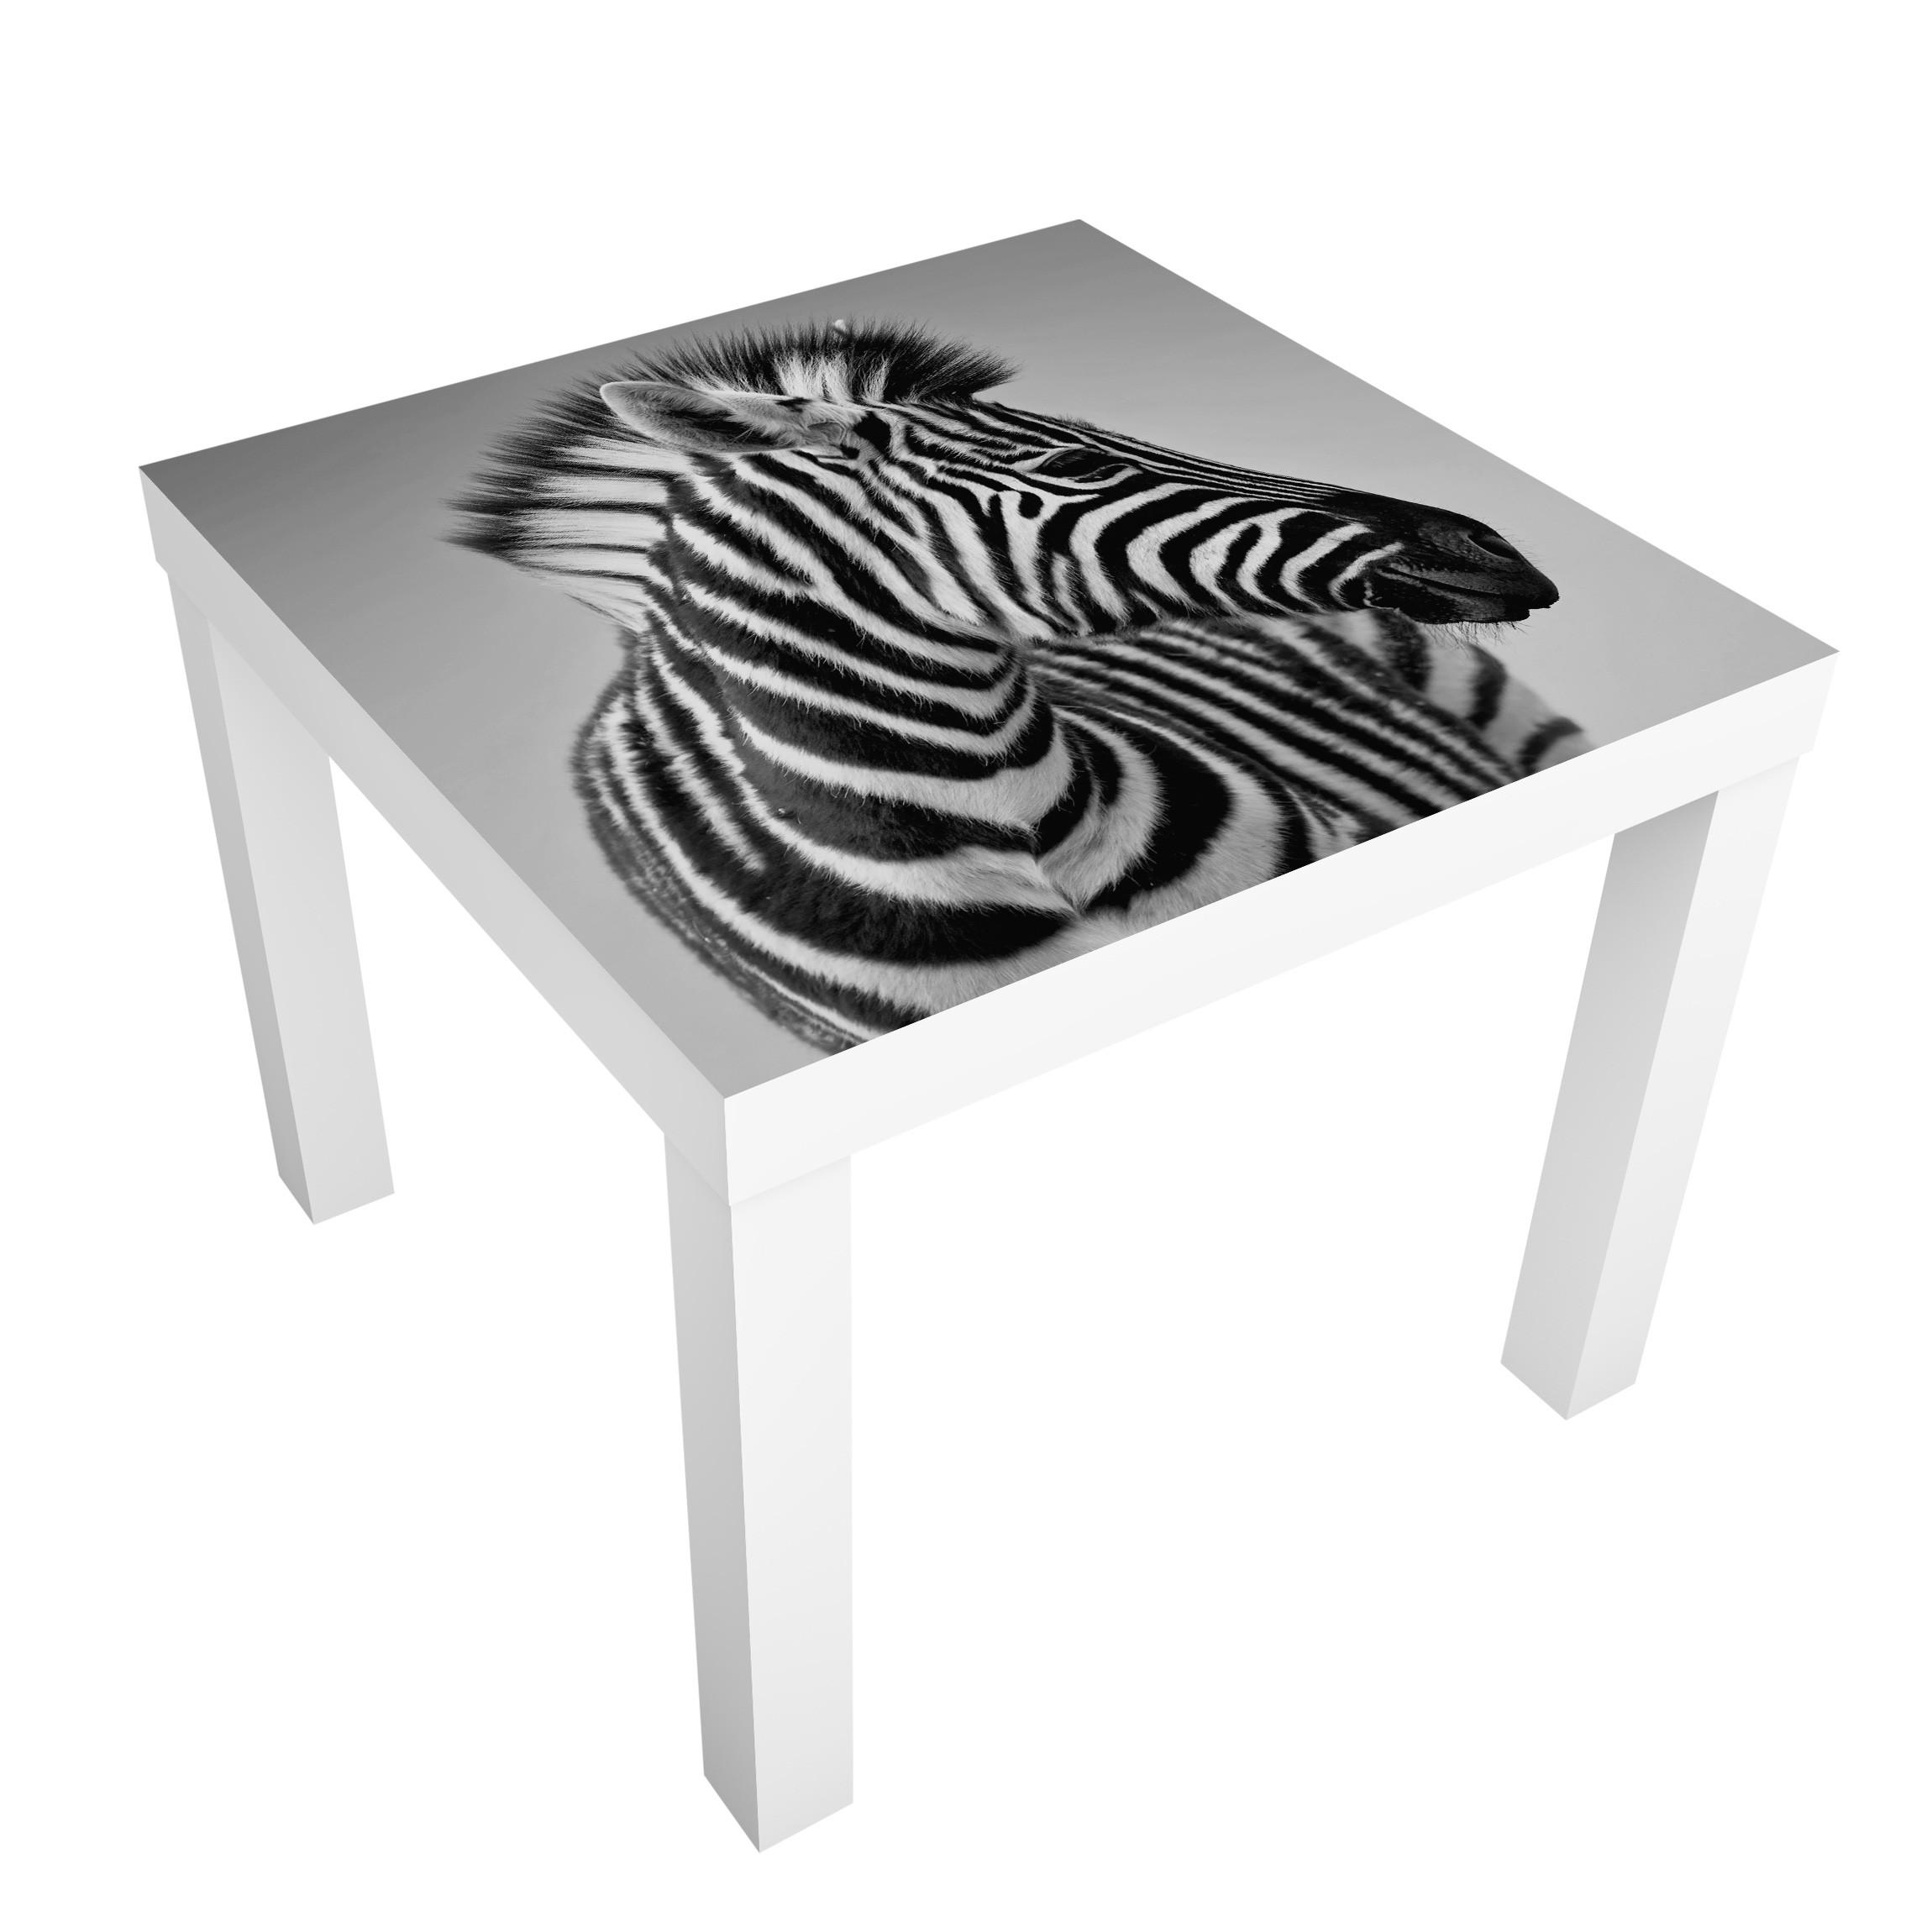 Furniture Decal For Ikea Lack Table Zebra Baby Portrait Ii